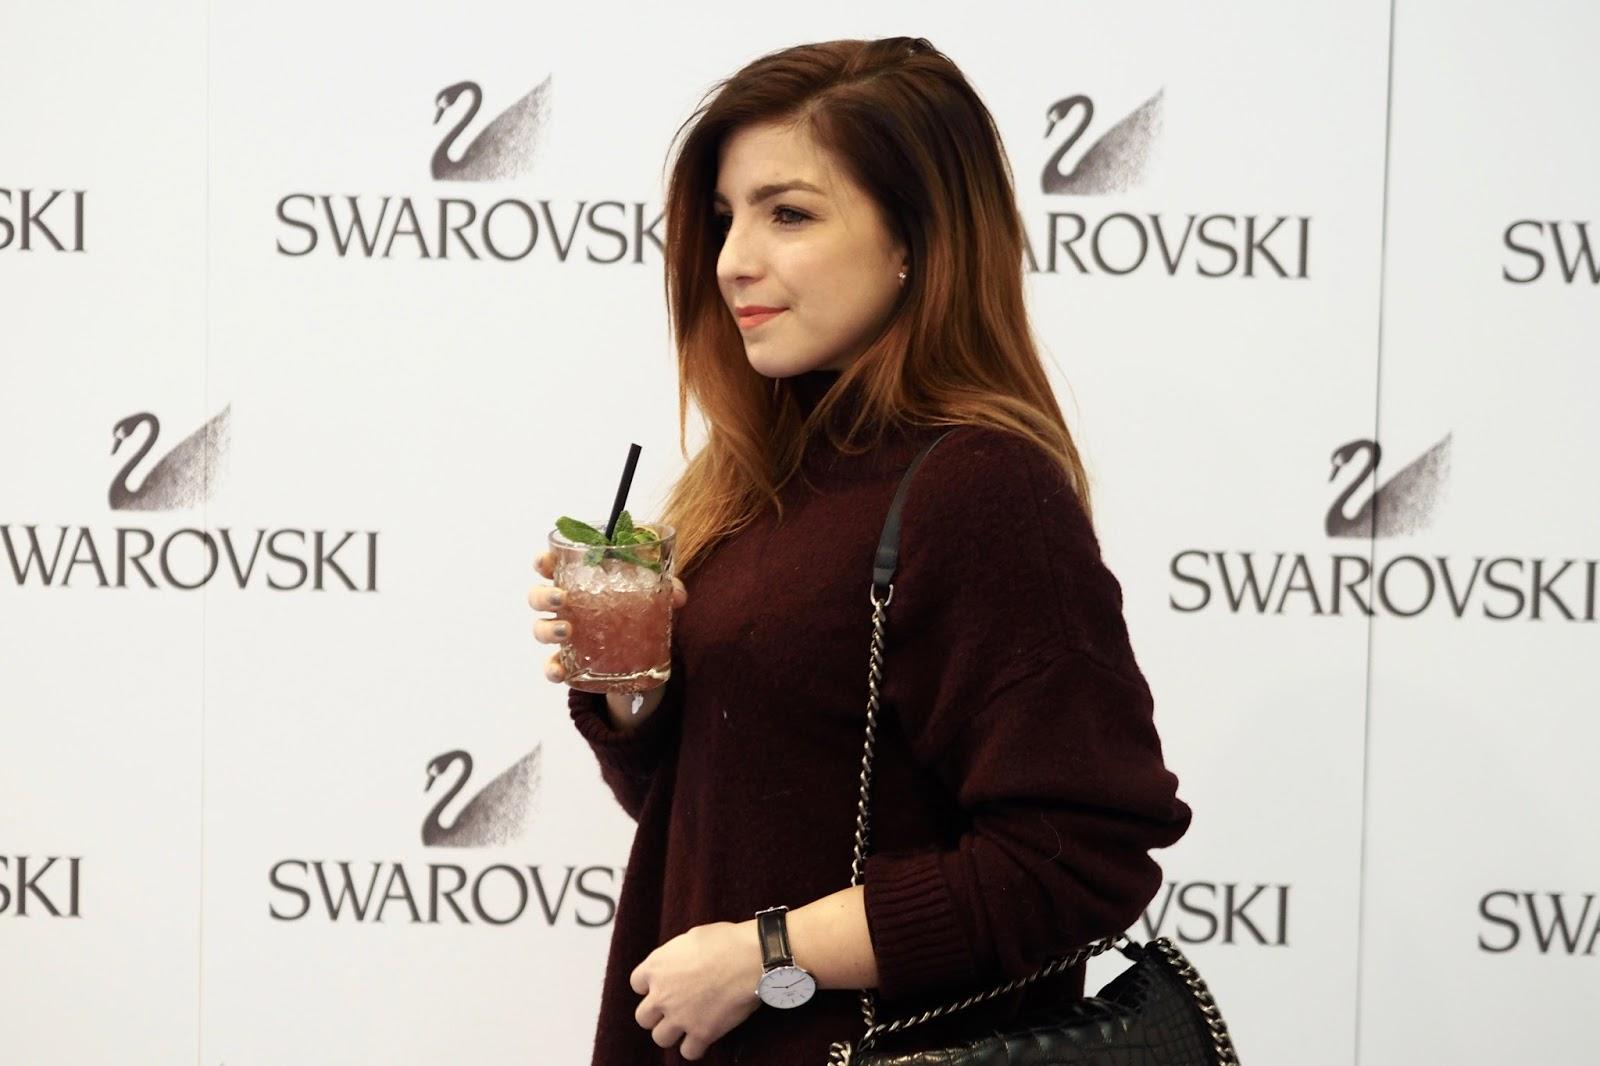 SWAROVSKI 11